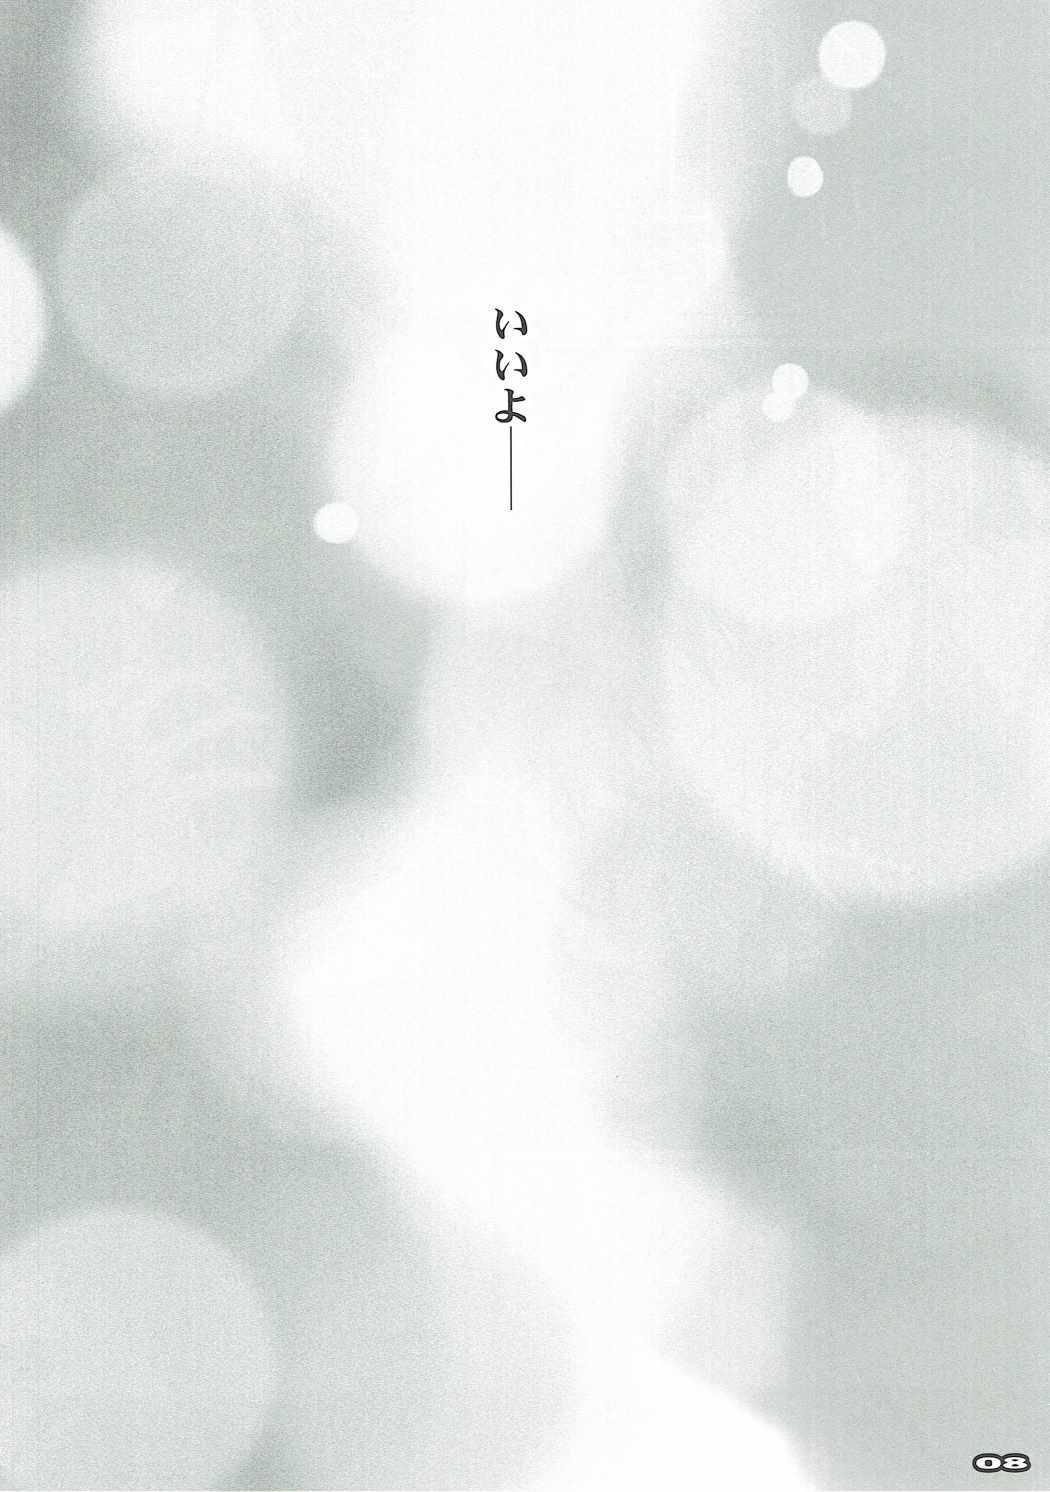 AR Rain - Remember My Love 6